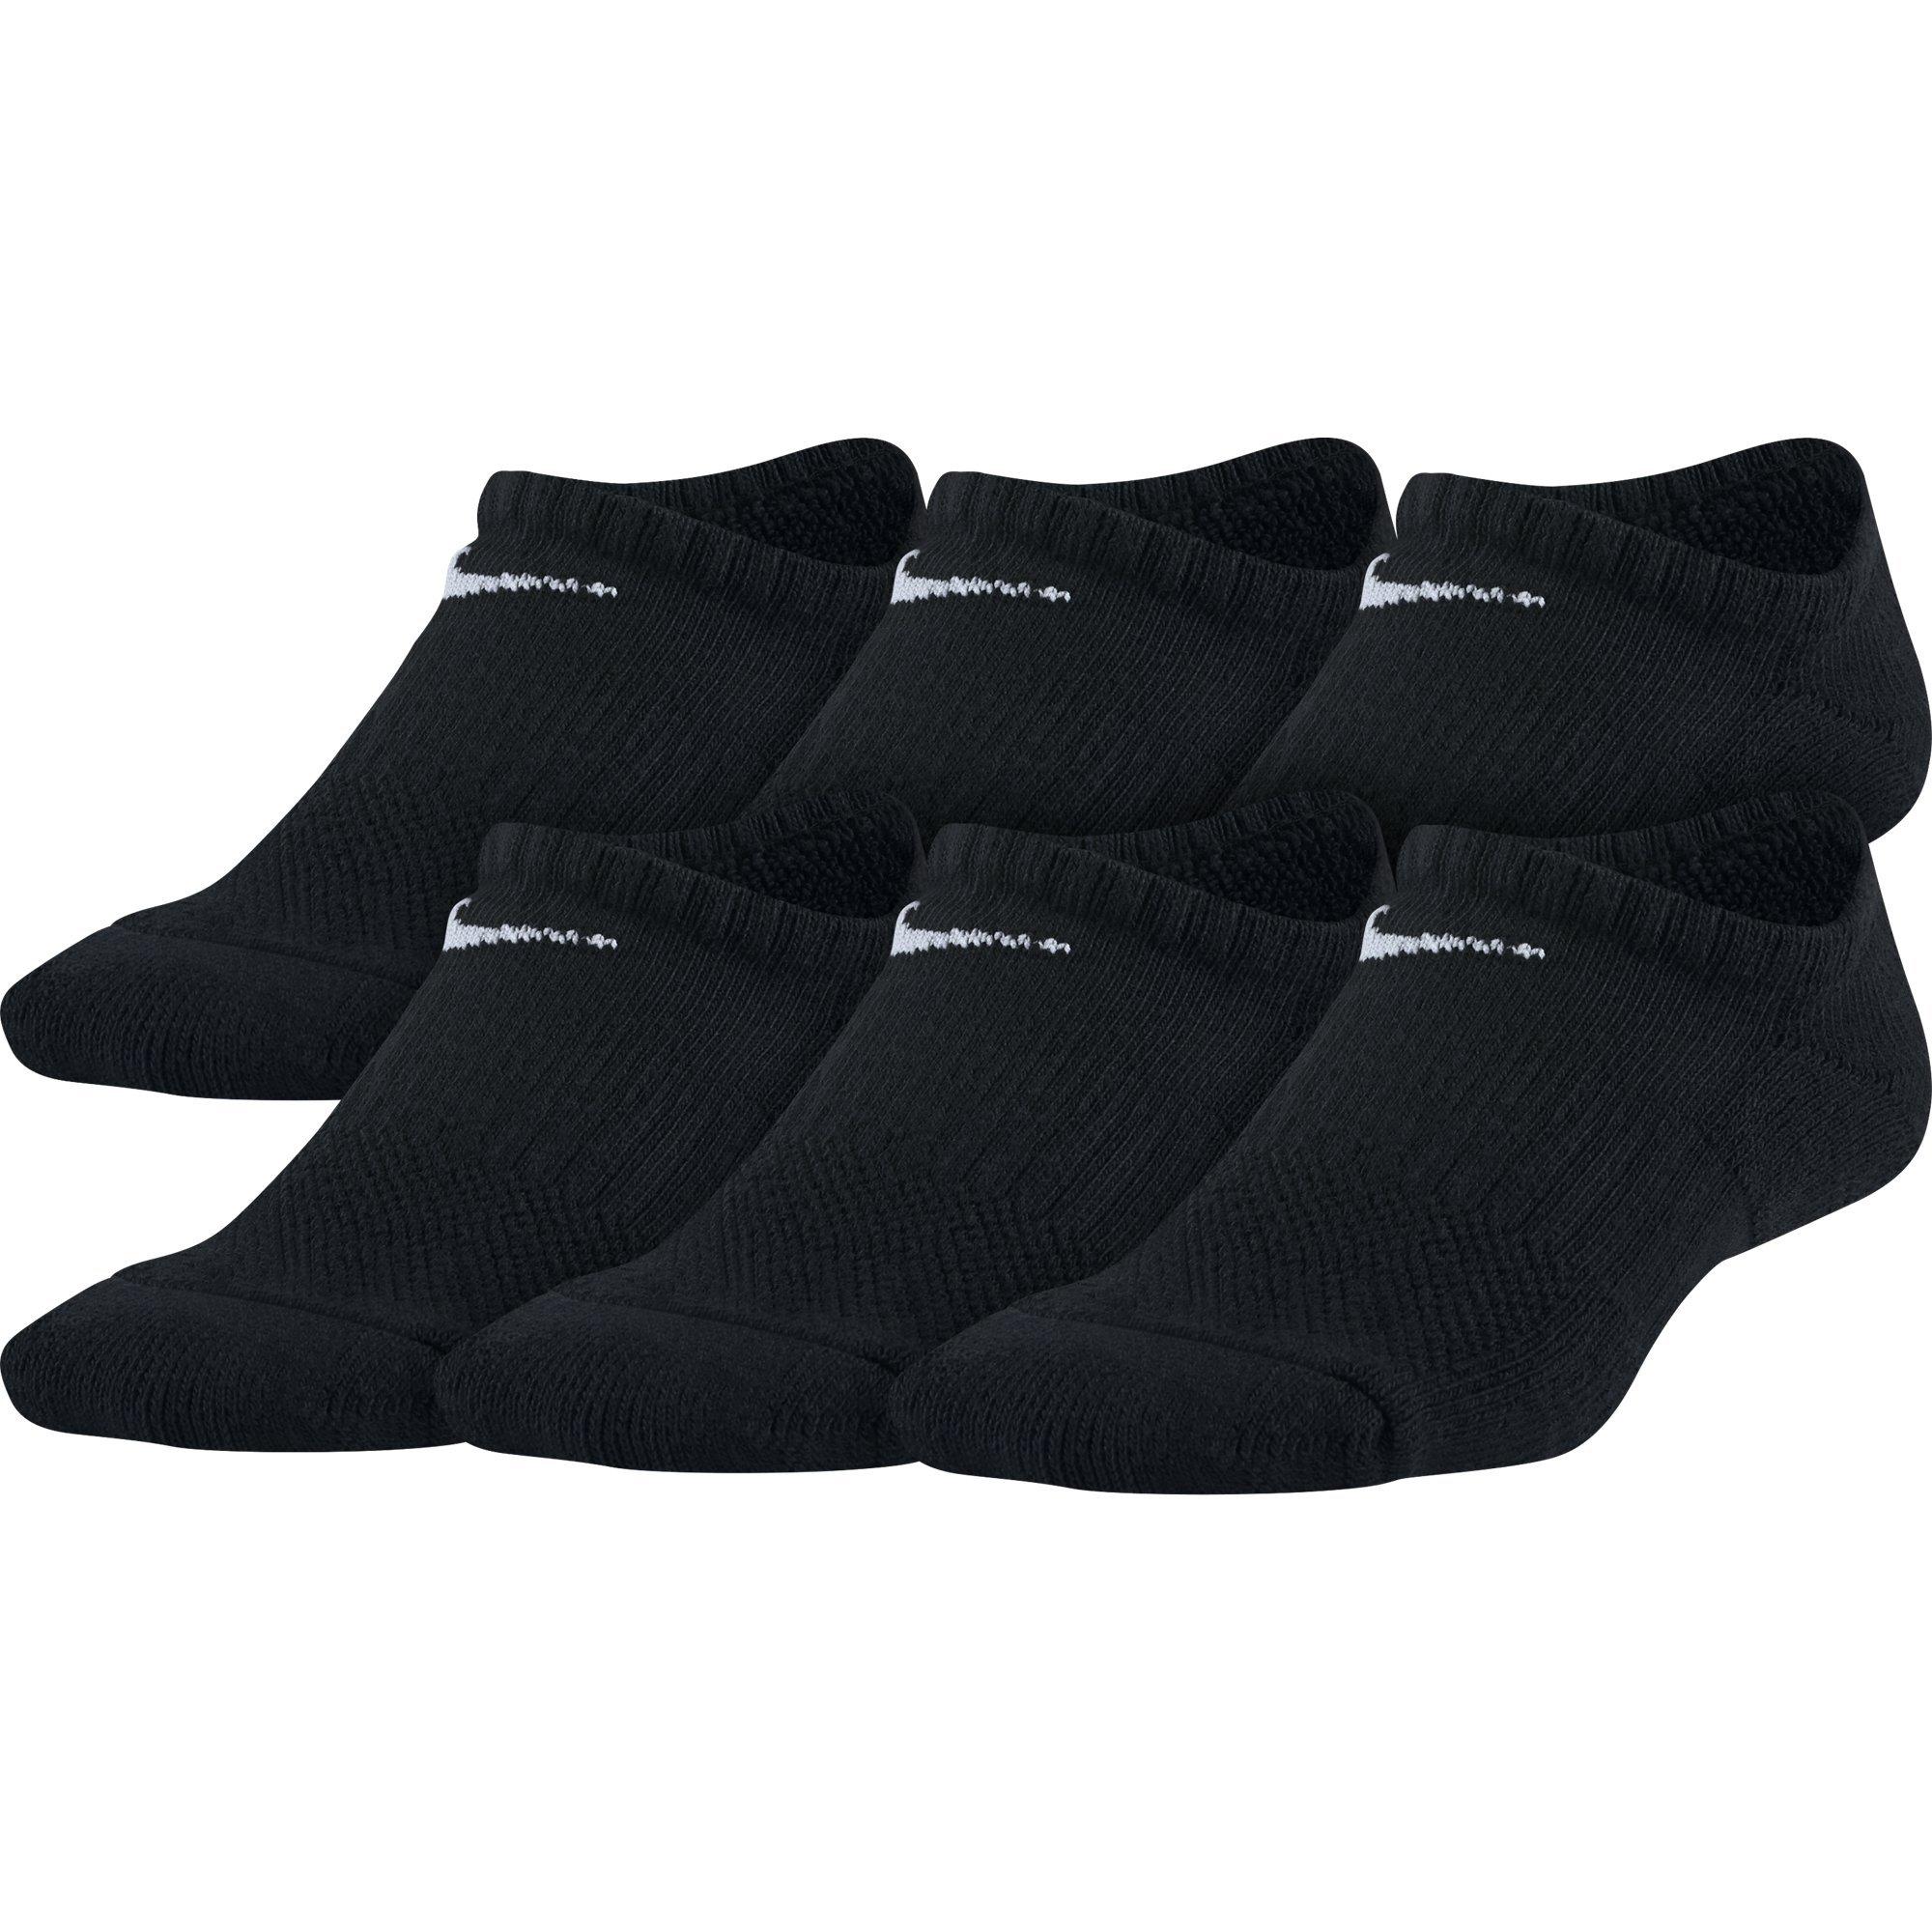 NIKE Kids' Unisex Everyday Cushioned No-Show Socks (6 Pair), Black/White, Small